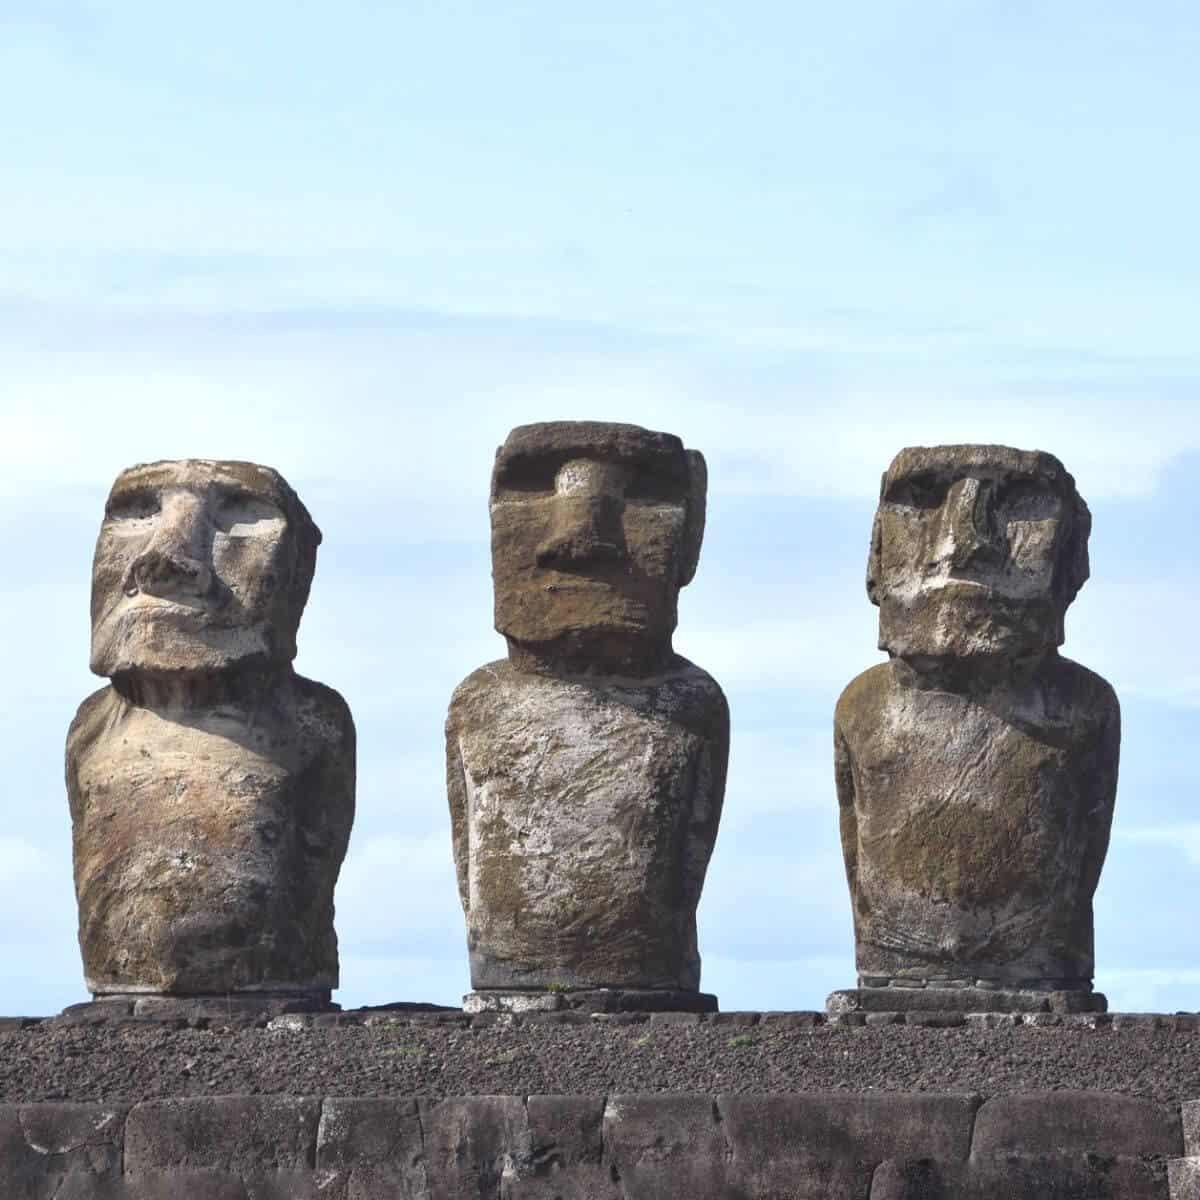 Three moai statues in Easter Island.